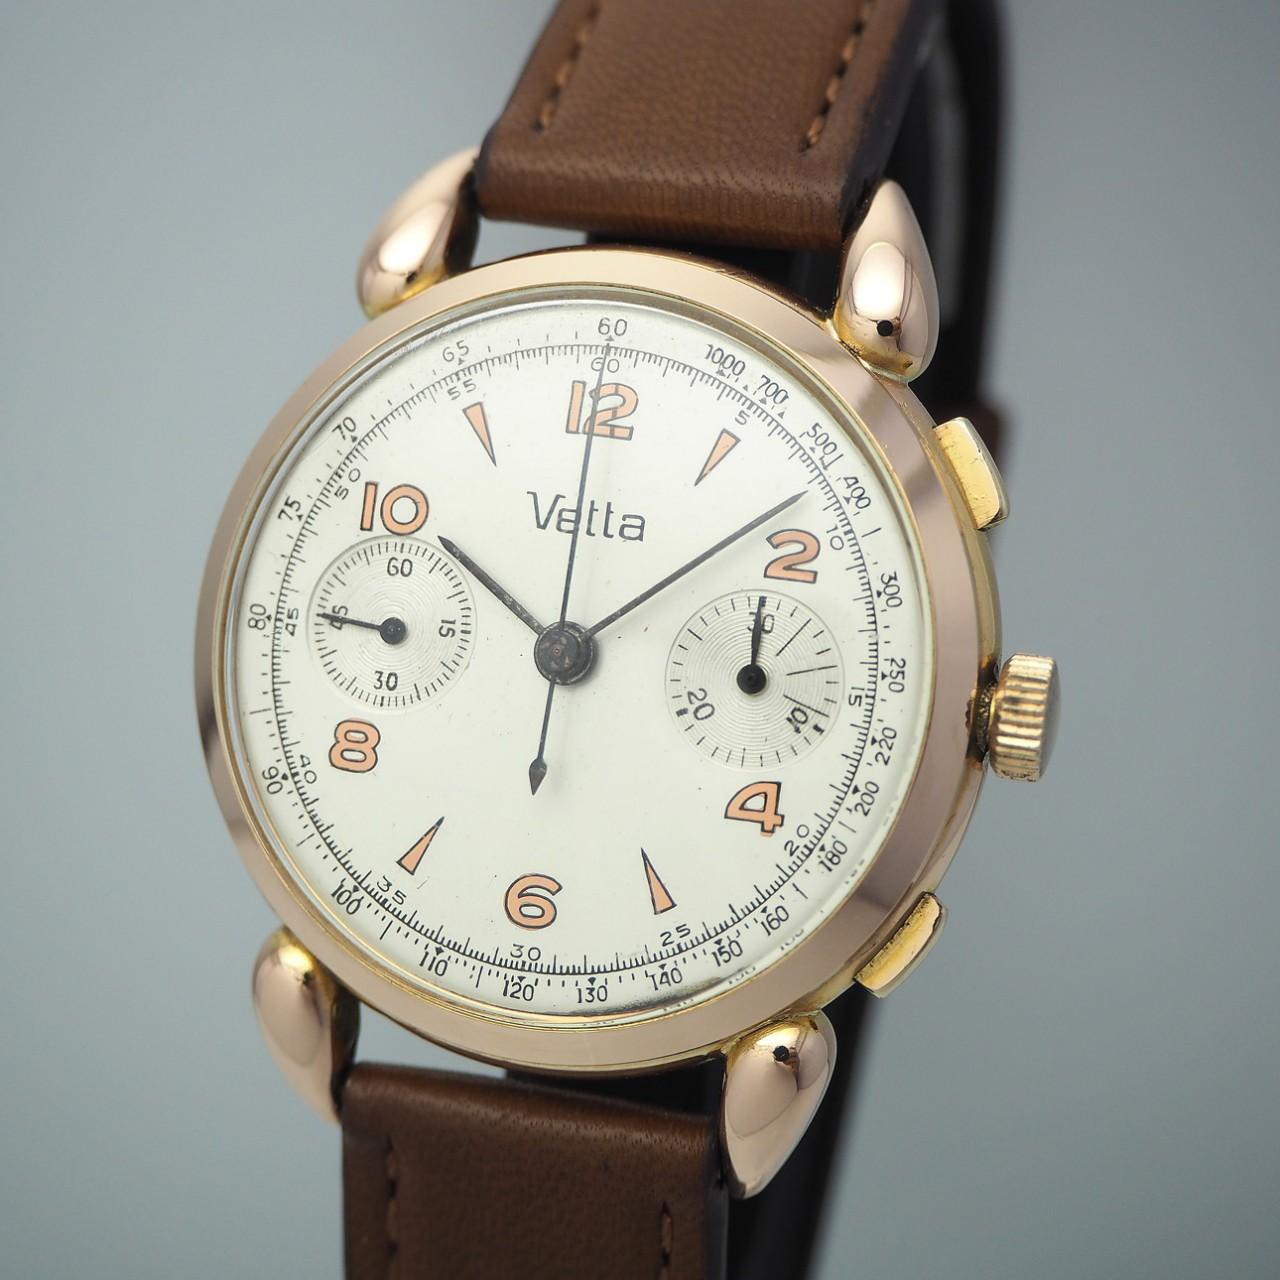 Vetta Chronograph Vintage Cal.Valjoux 22 -Gold 18k/750